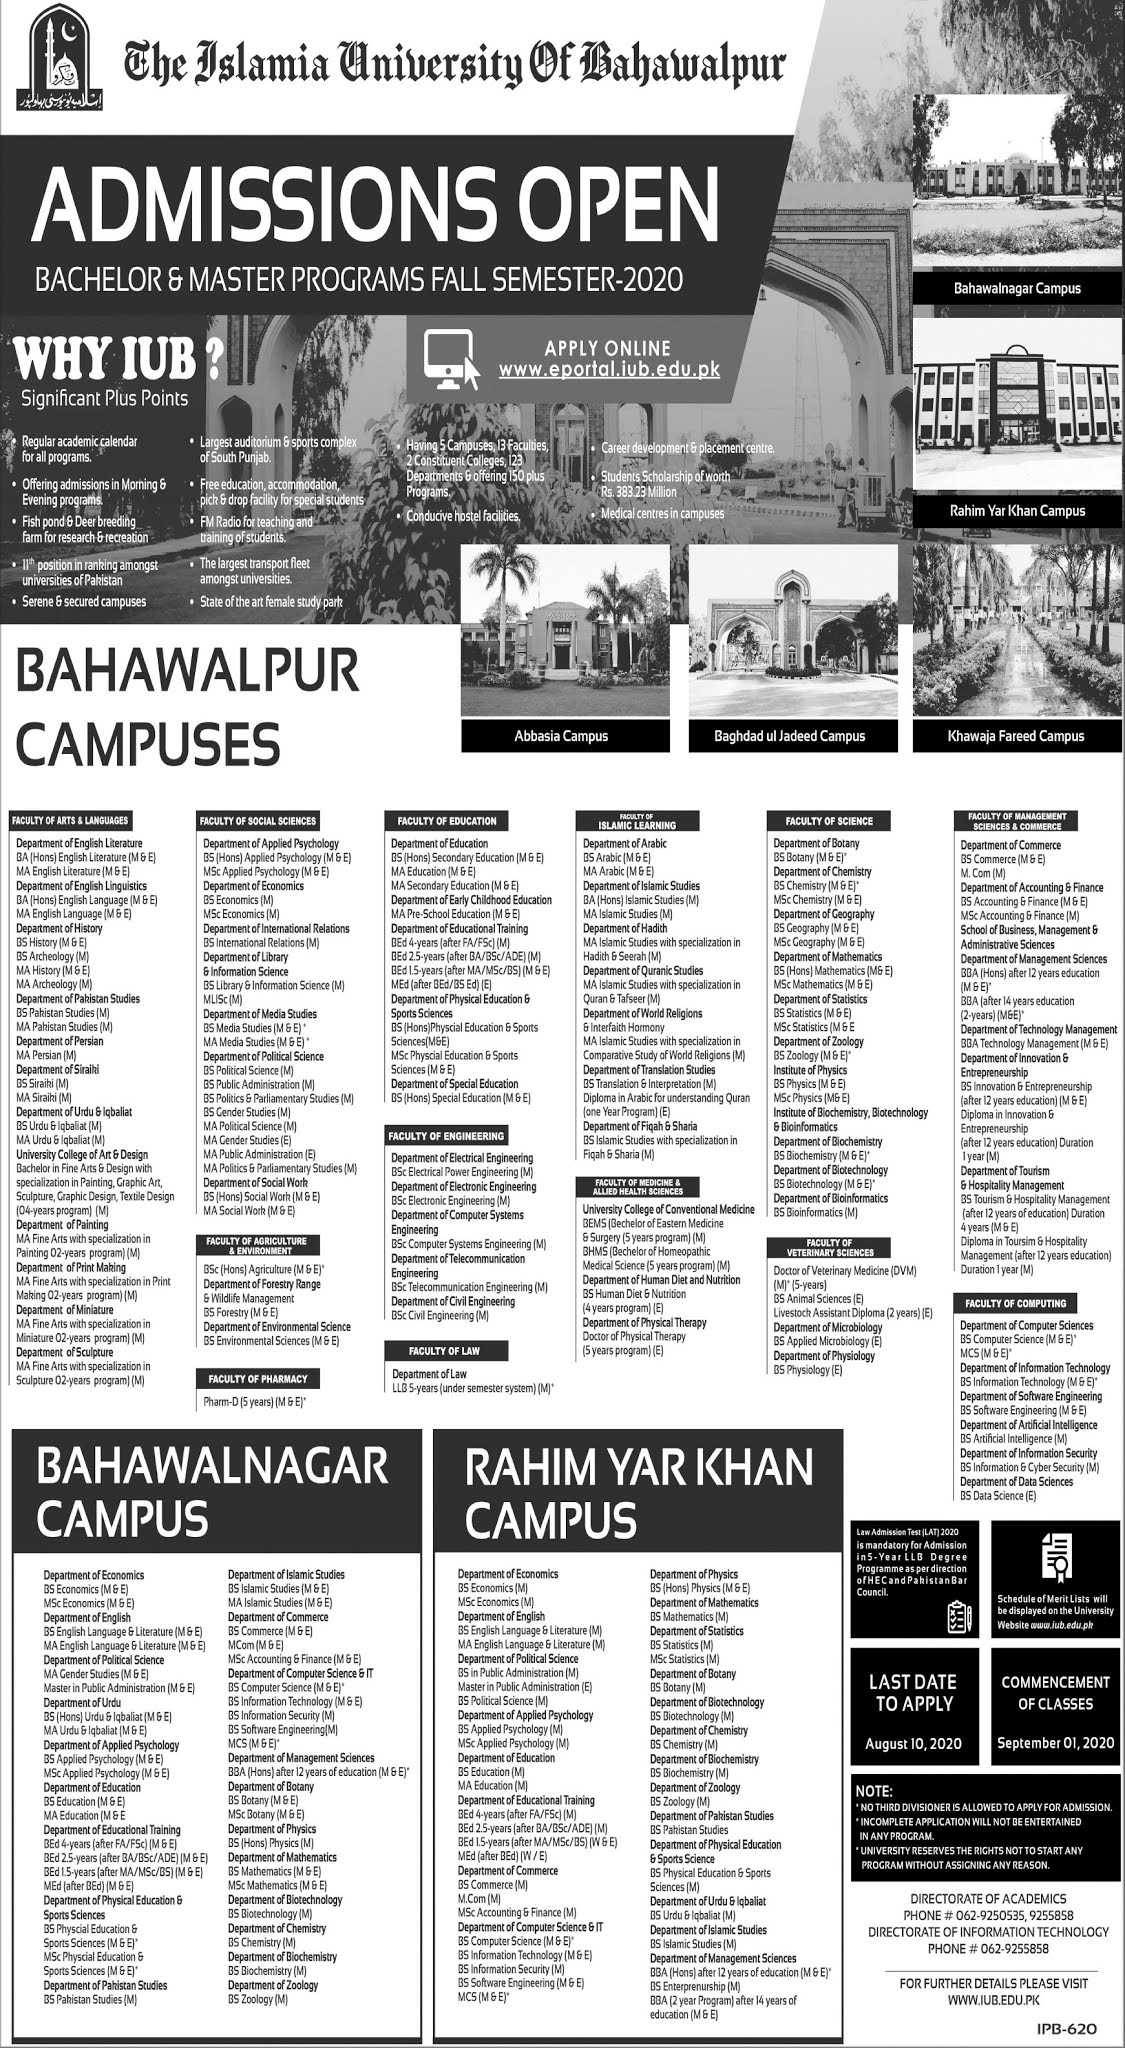 Islamia University Bahawalpur (IUB) Admissions Fall 2020